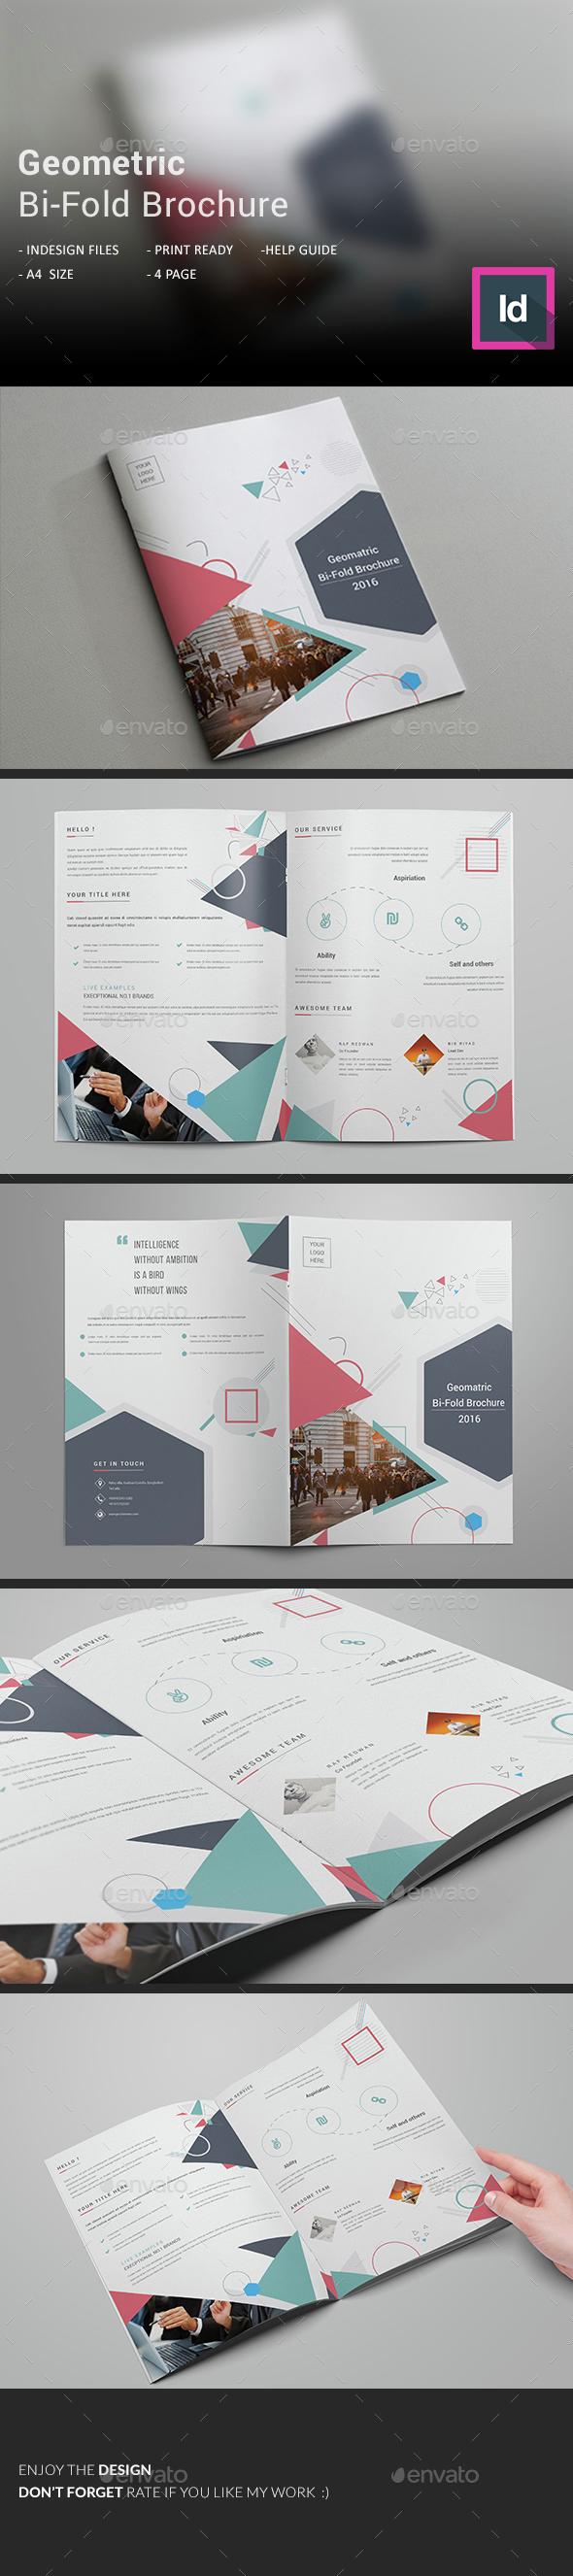 Geometric Bi-Fold Brochure  - Corporate Brochures